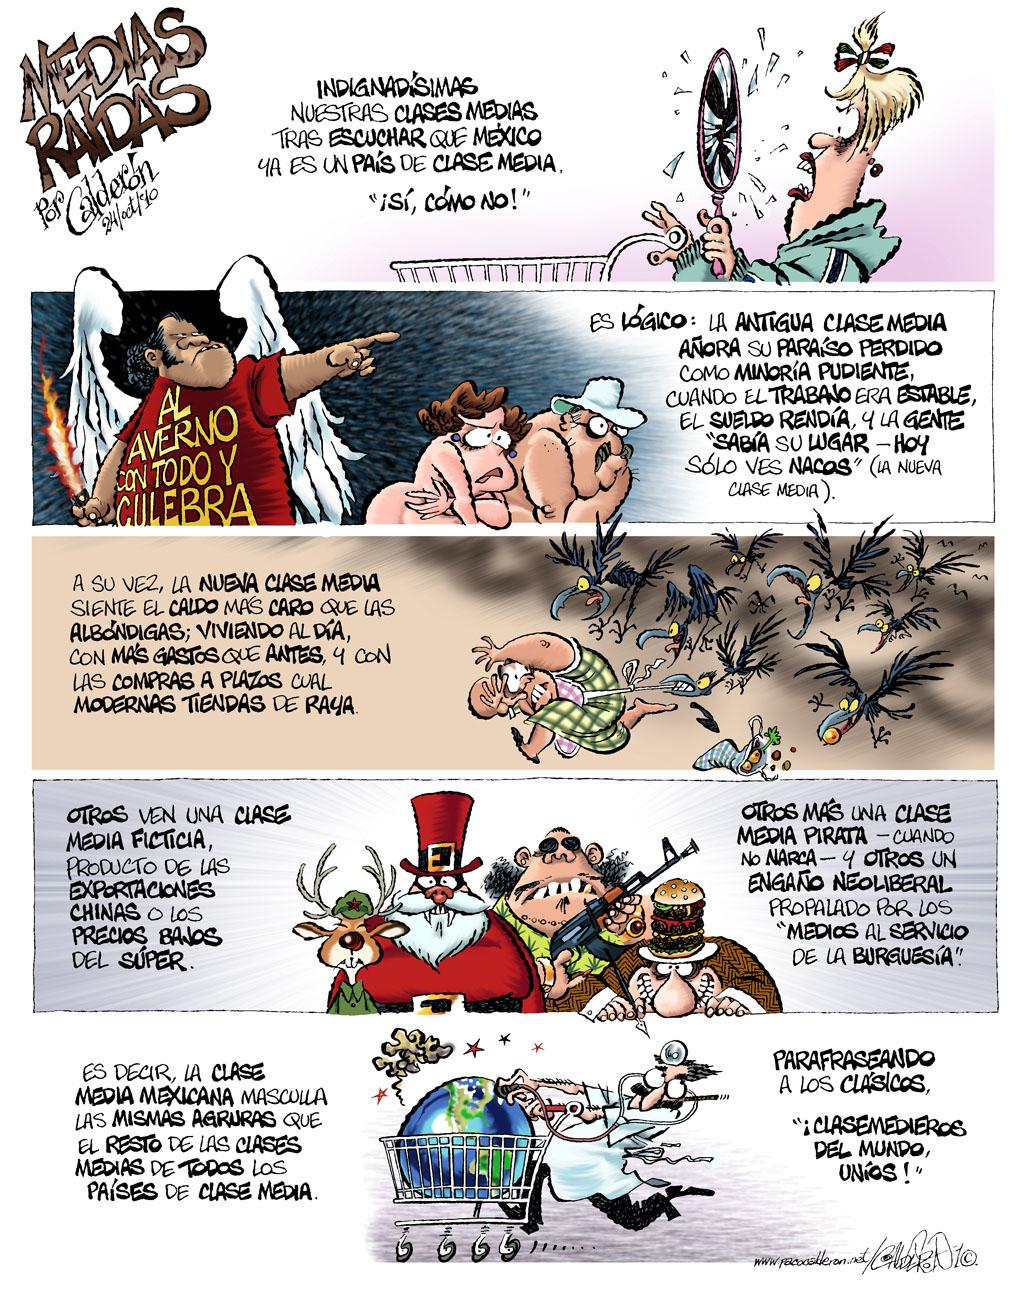 Medias raídas - Calderón